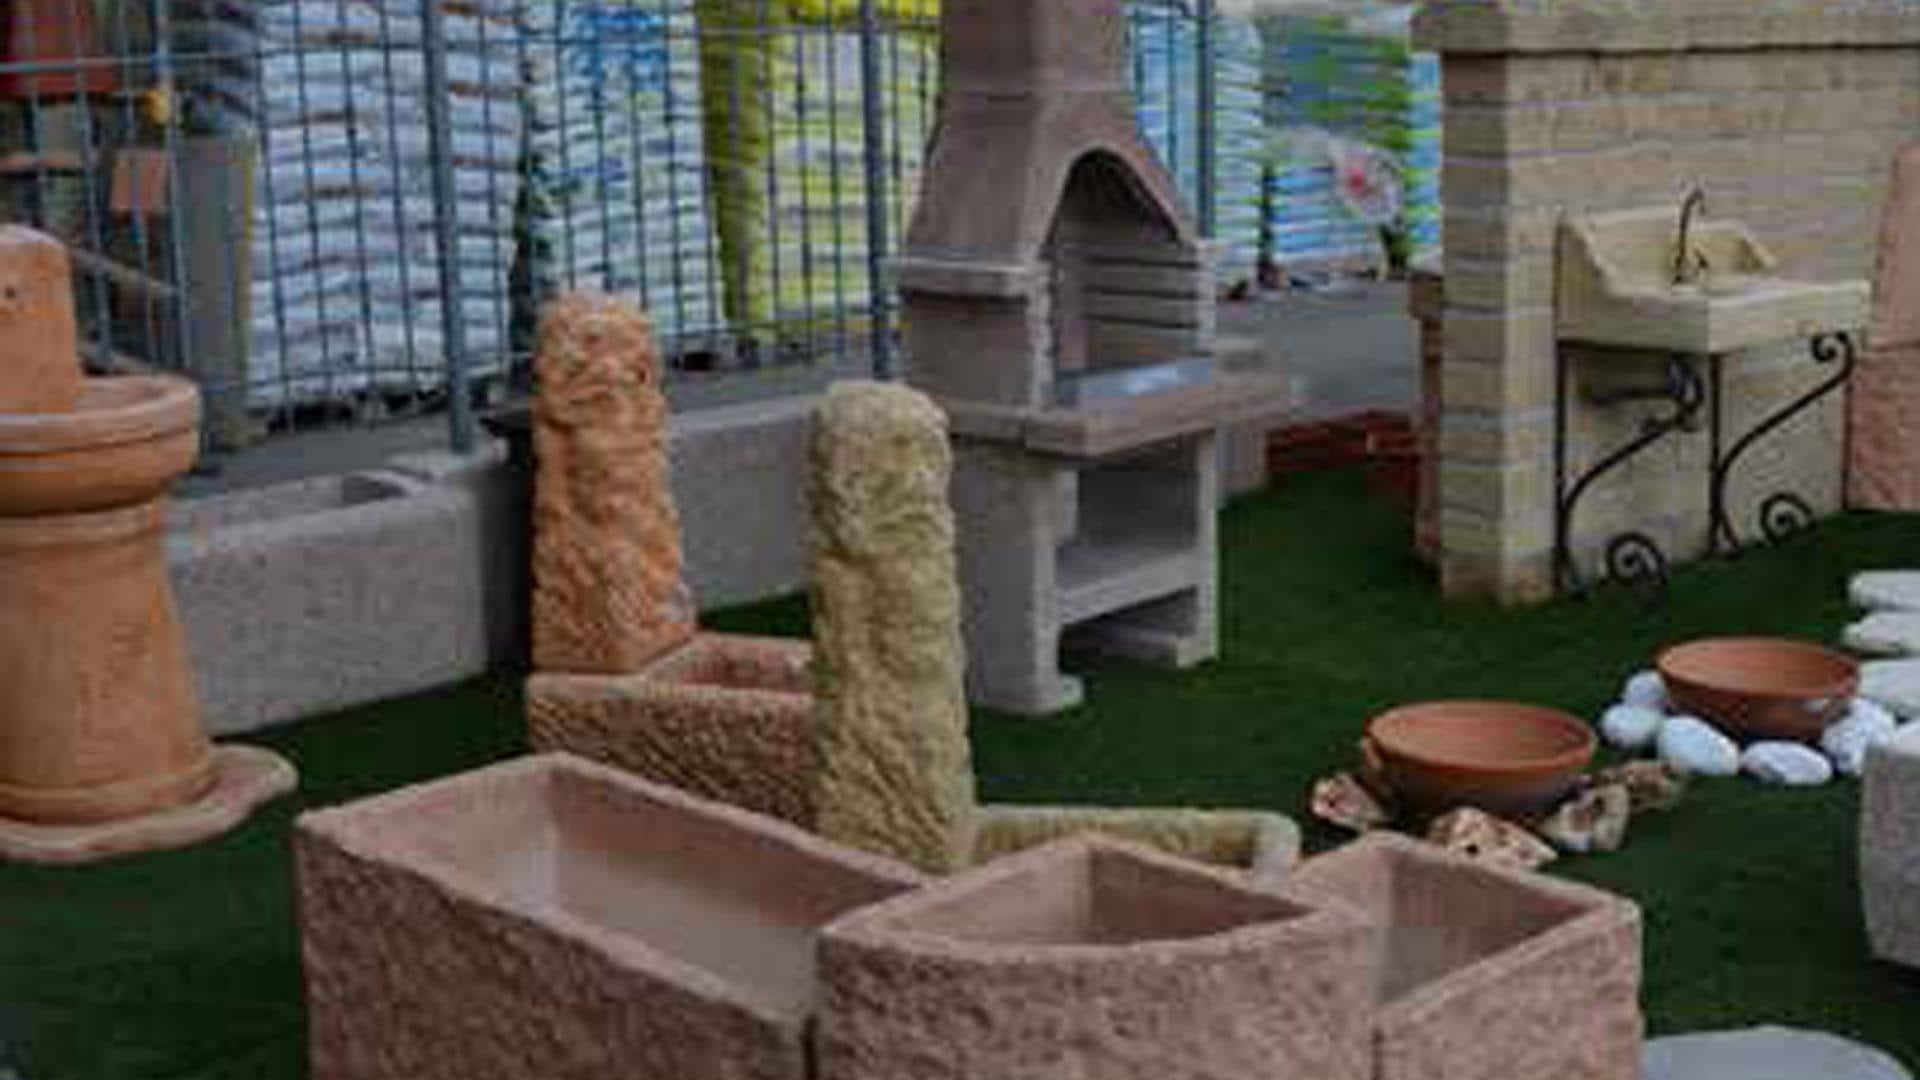 Giardinaggio e arredo urbano eternedile for Vendita arredo urbano